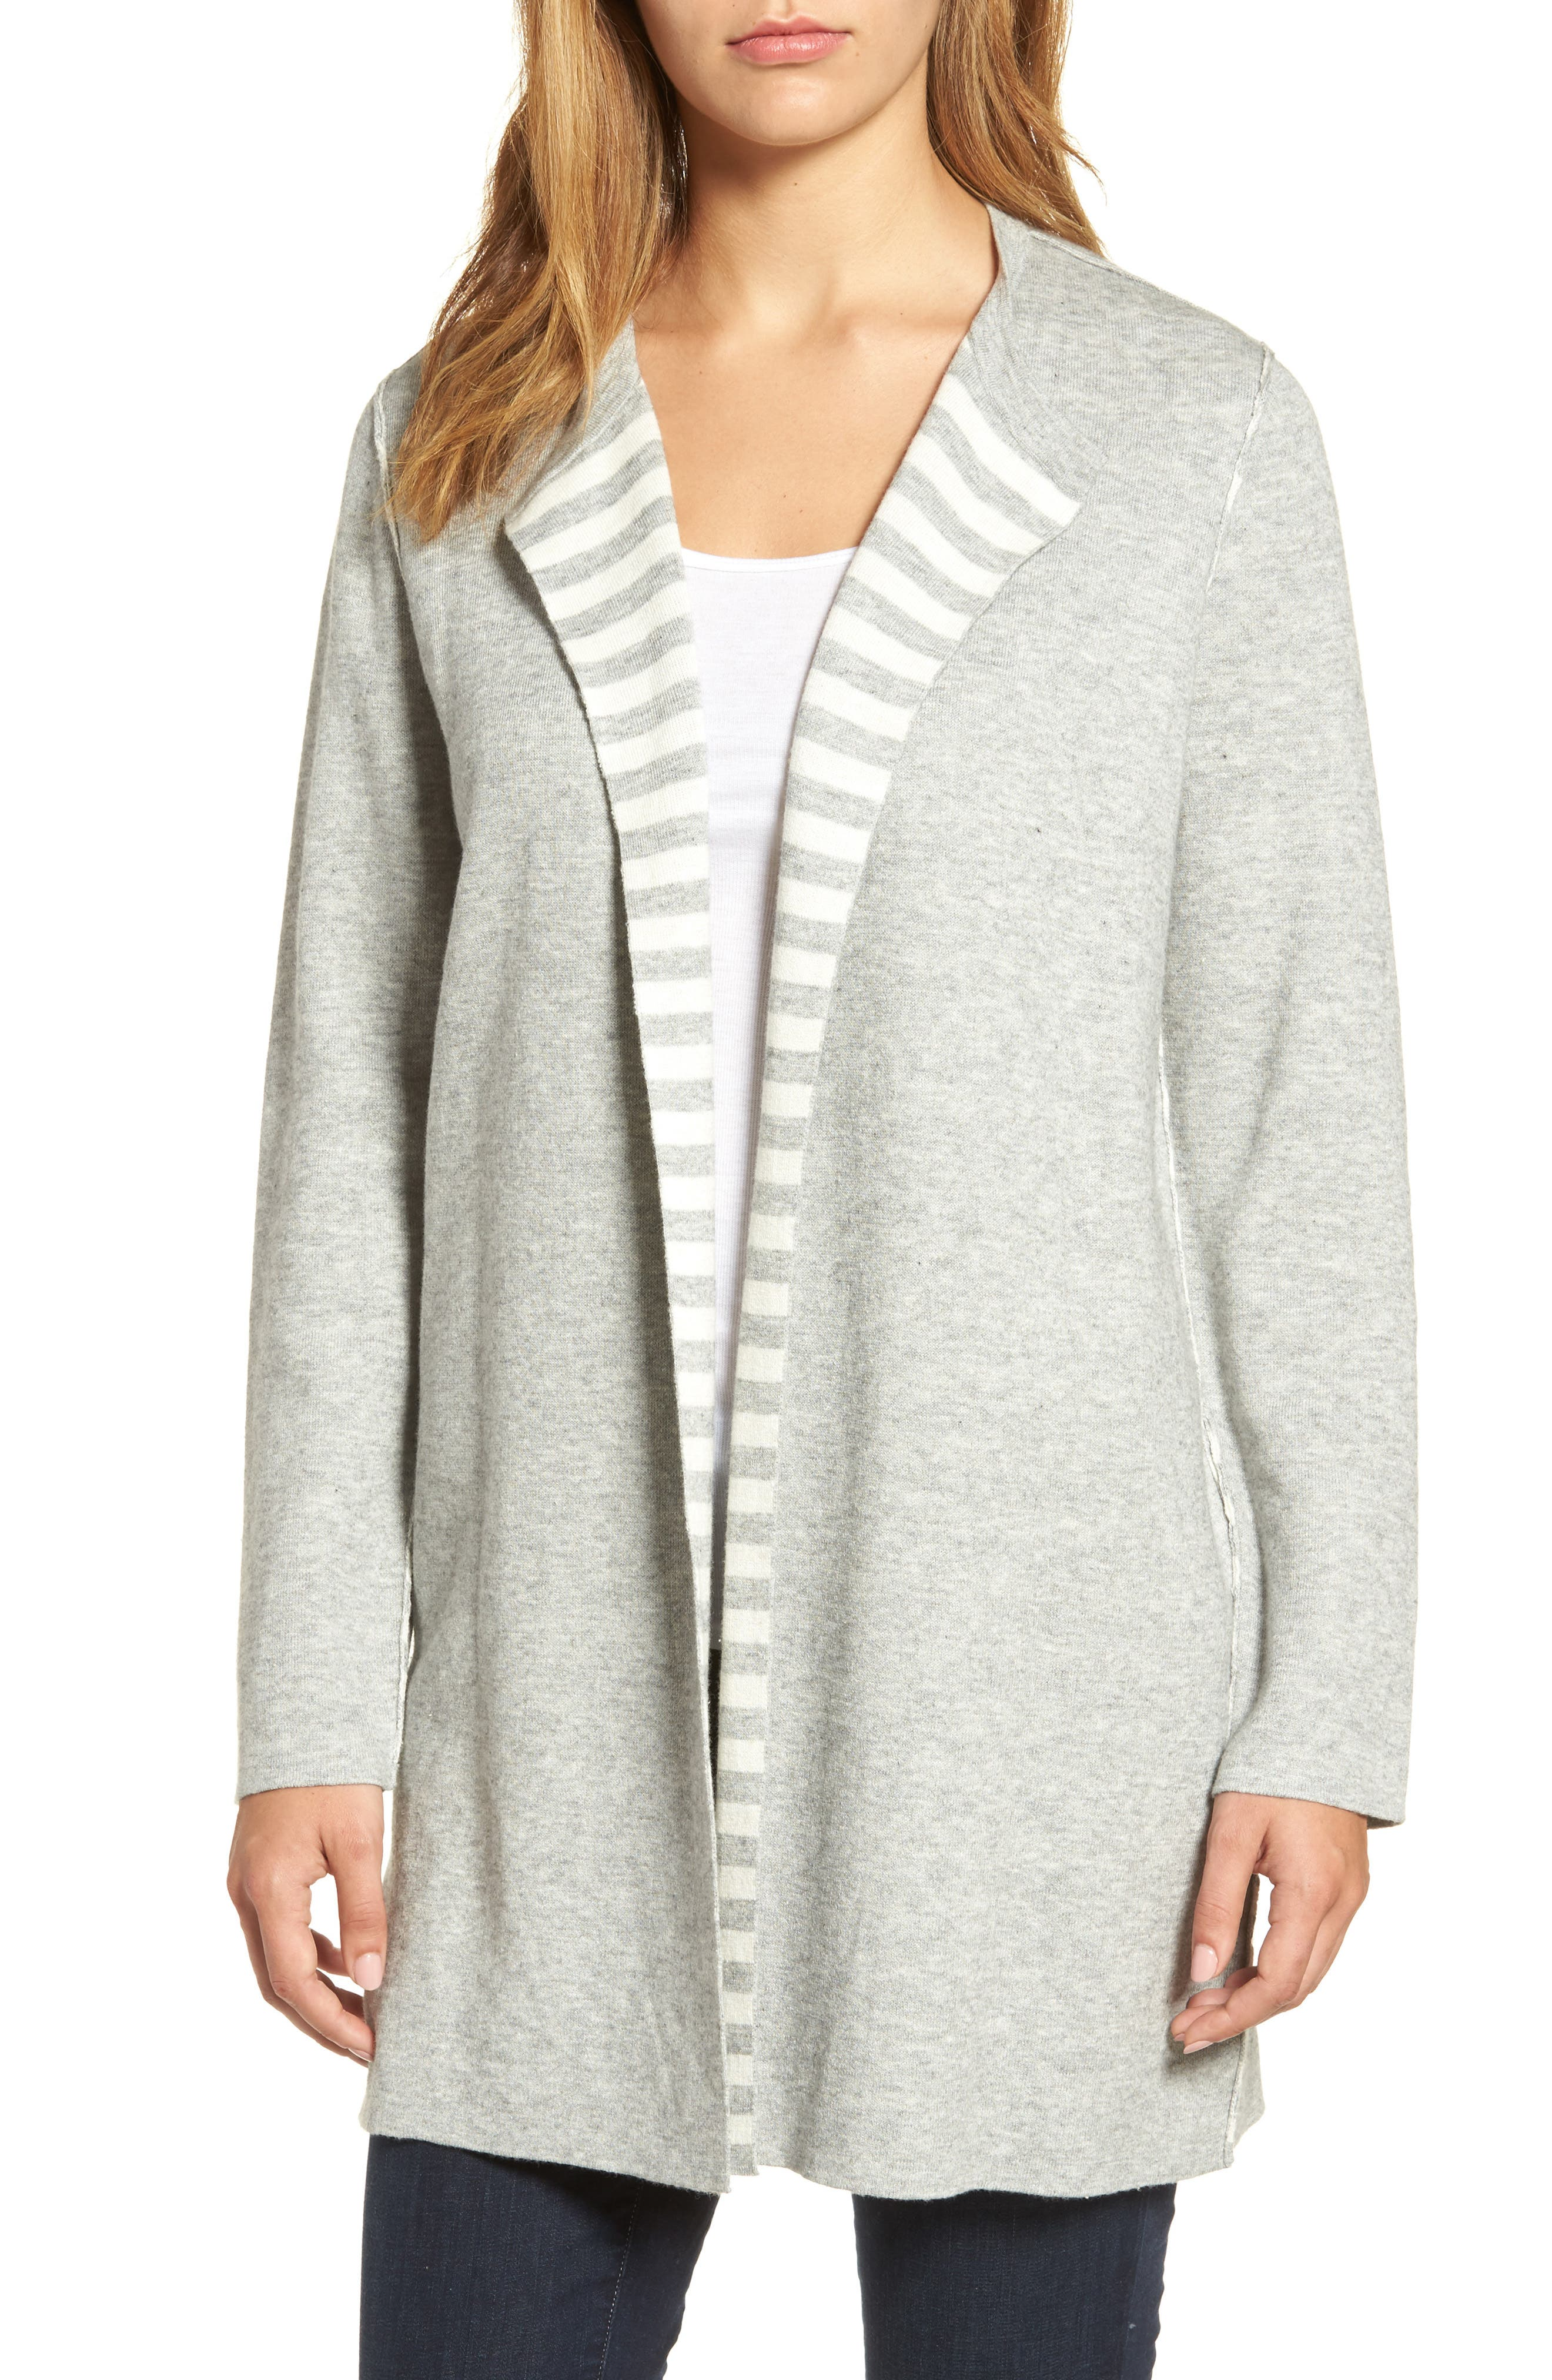 Reversible Organic Cotton Blend Cardigan,                         Main,                         color, 020